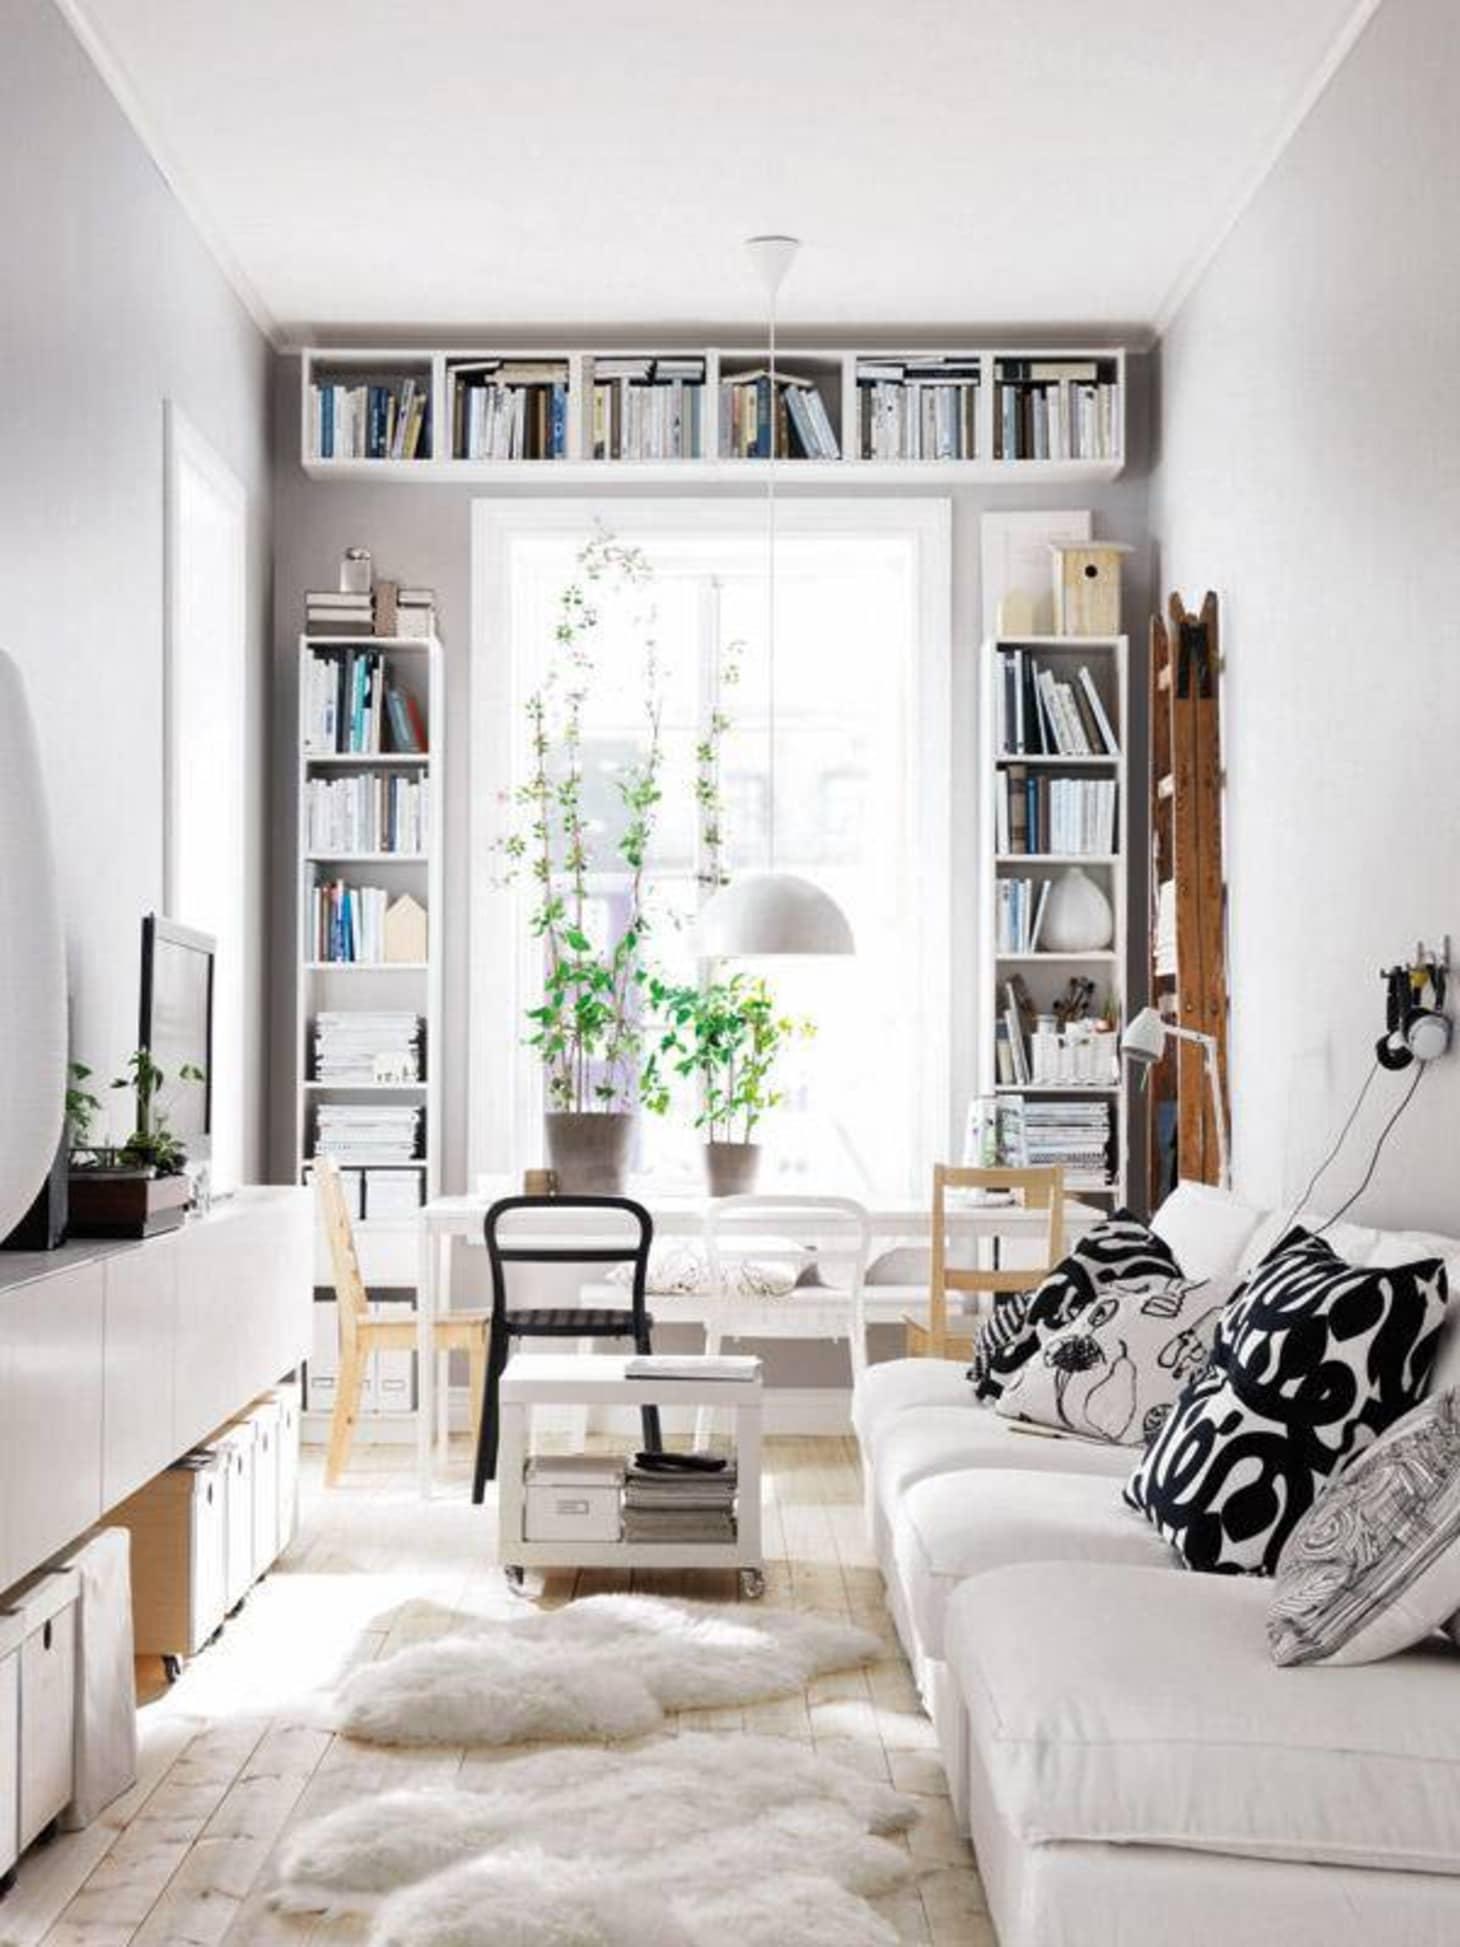 Small Living Room Storage Ideas: 30 Small Living Room Decorating & Design Ideas